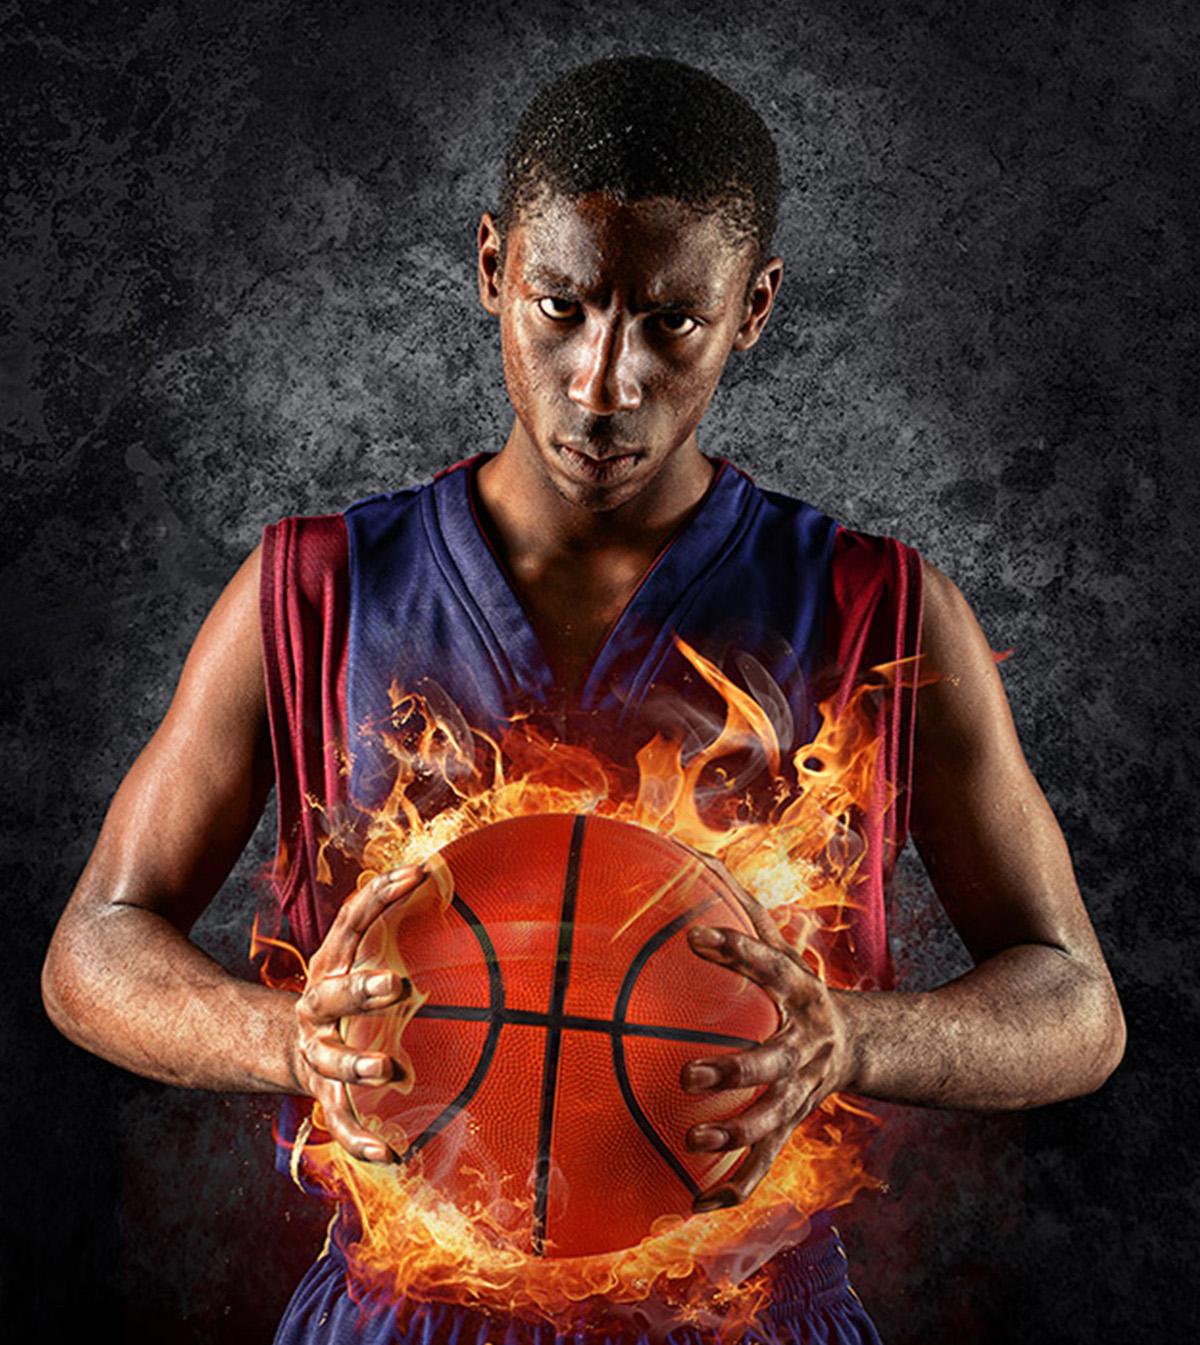 basket-ball-shoot-sports-photography-brandon-barnard-professional-photographer.jpg